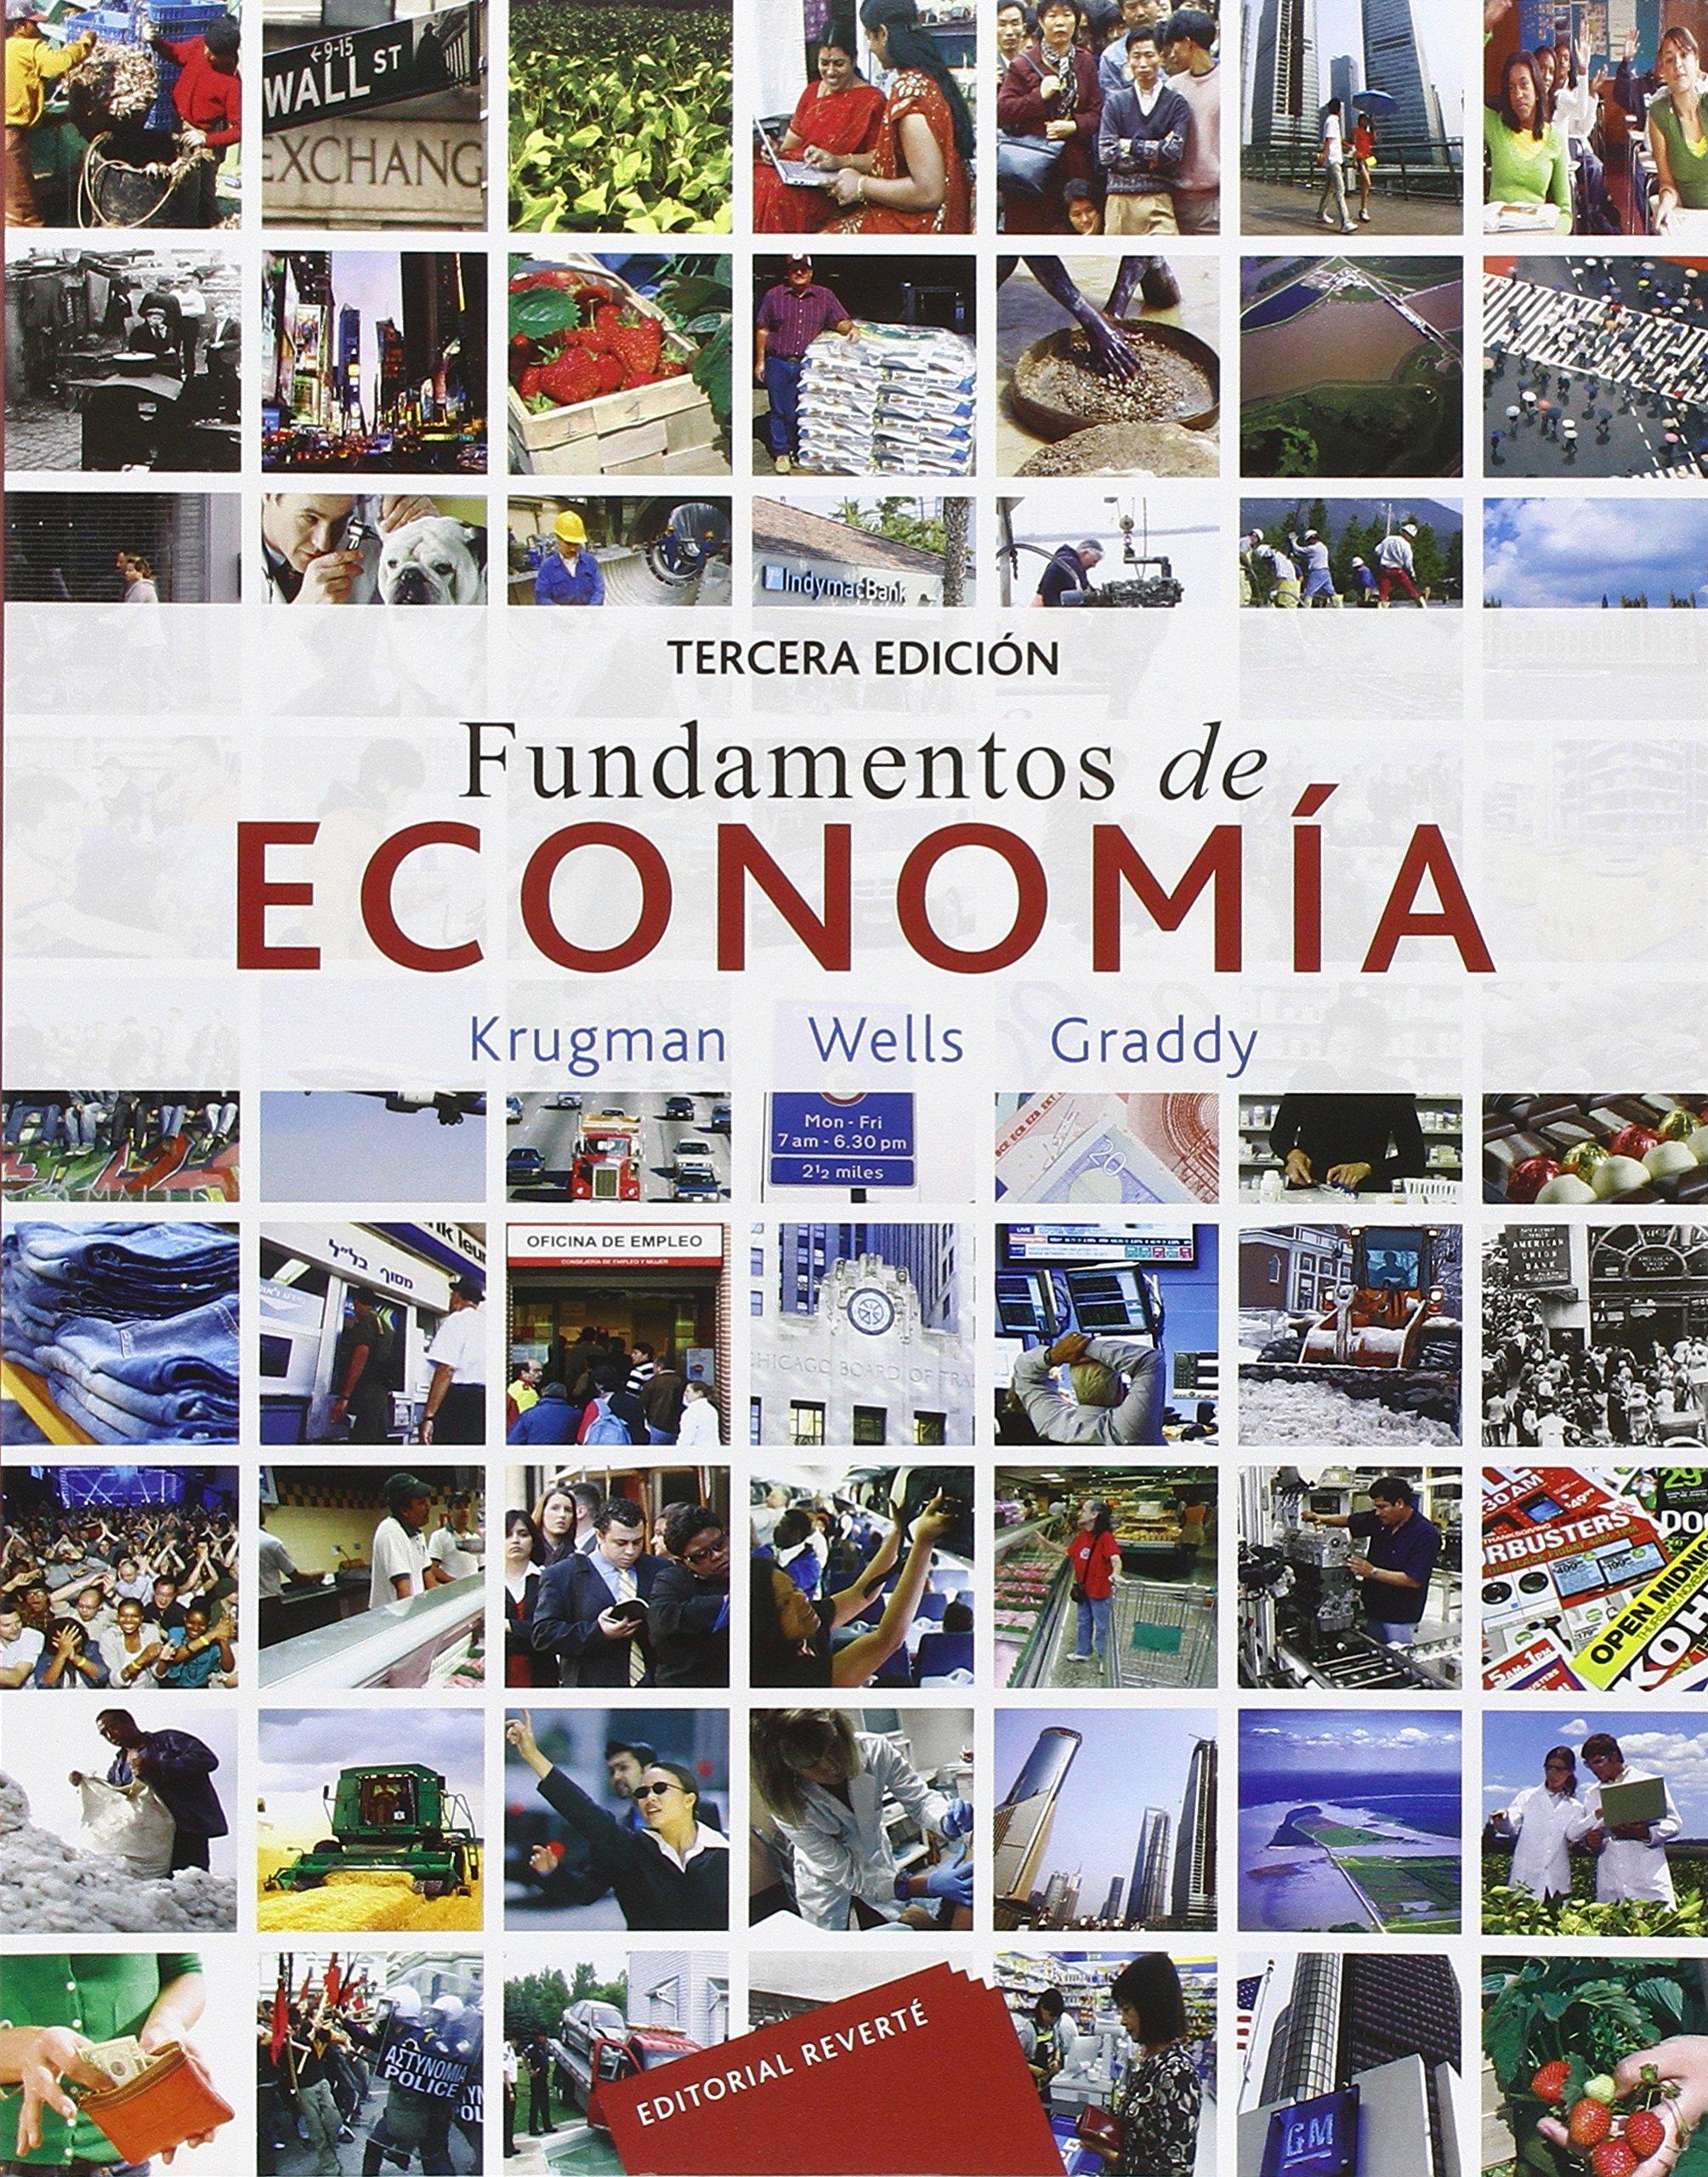 FUNDAMENTOS DE ECONOMIA 3A. ED. Tapa blanda – 10 dic 2014 PAUL KRUGMAN REVE0|#Reverte 8429126465 Economics